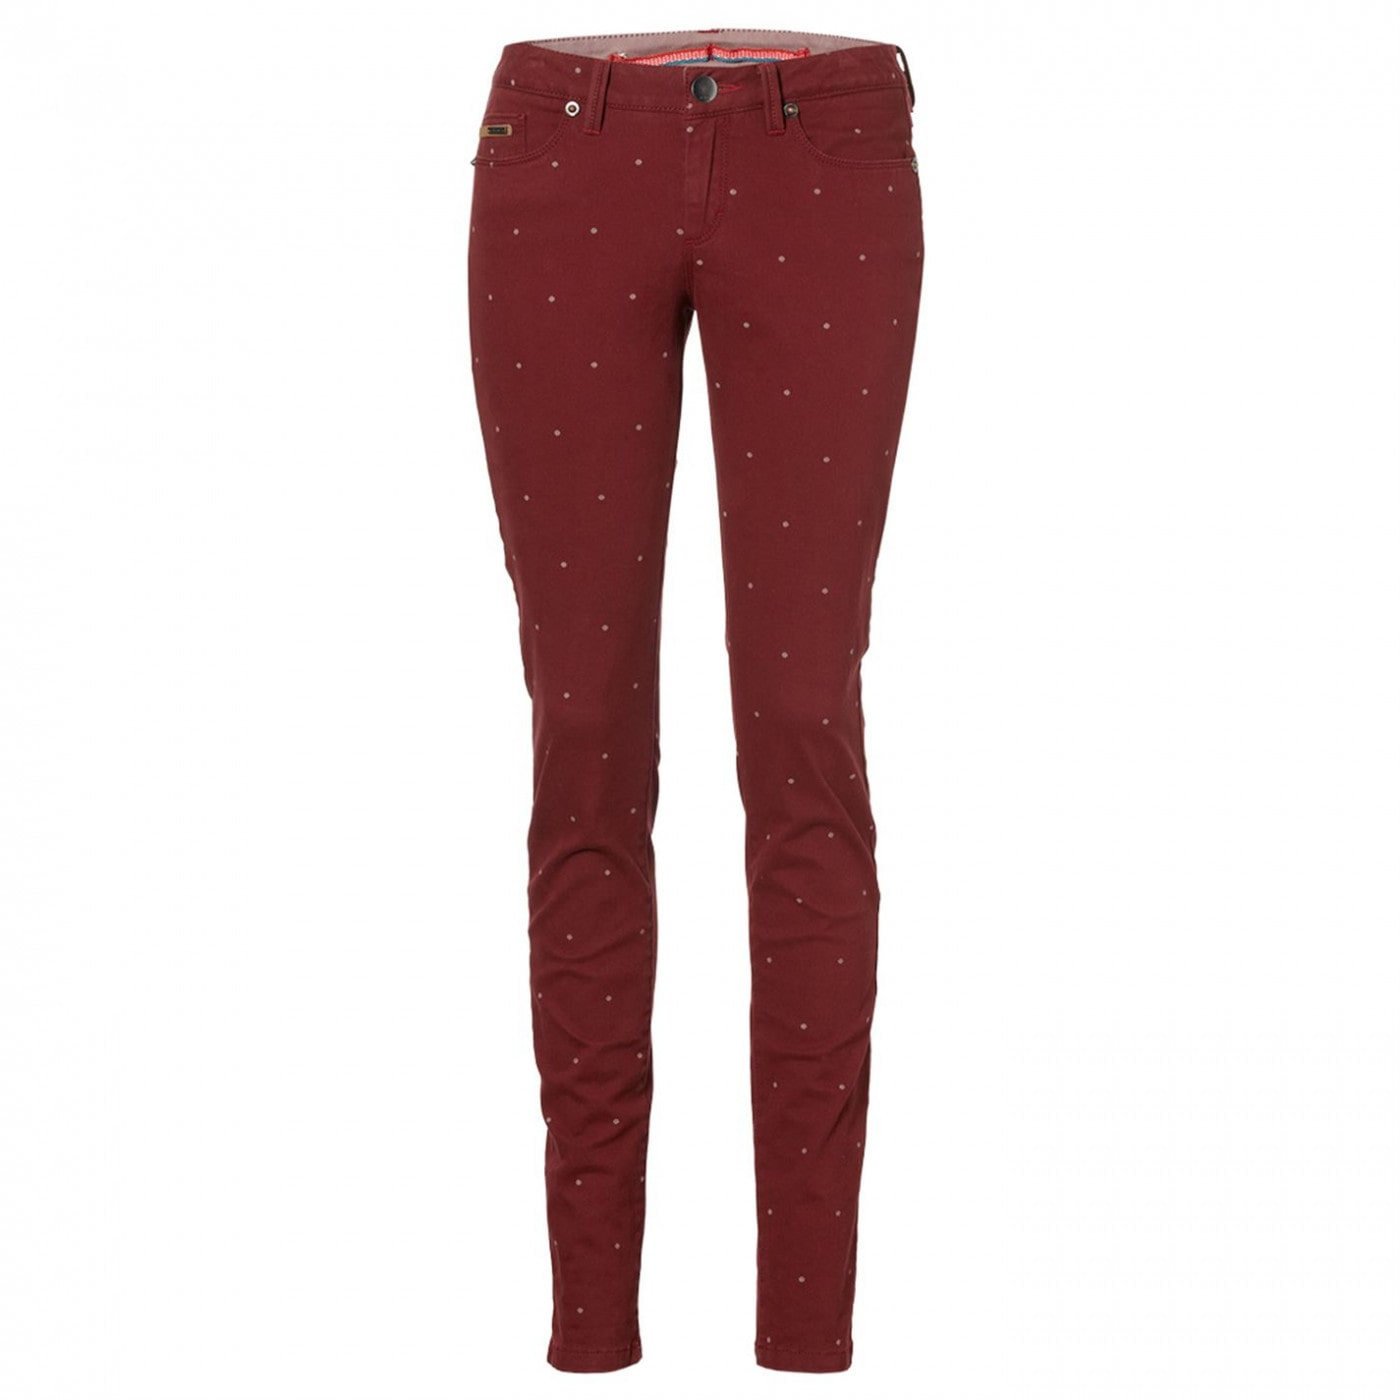 ONeill 5 Pocket Pants Ladies